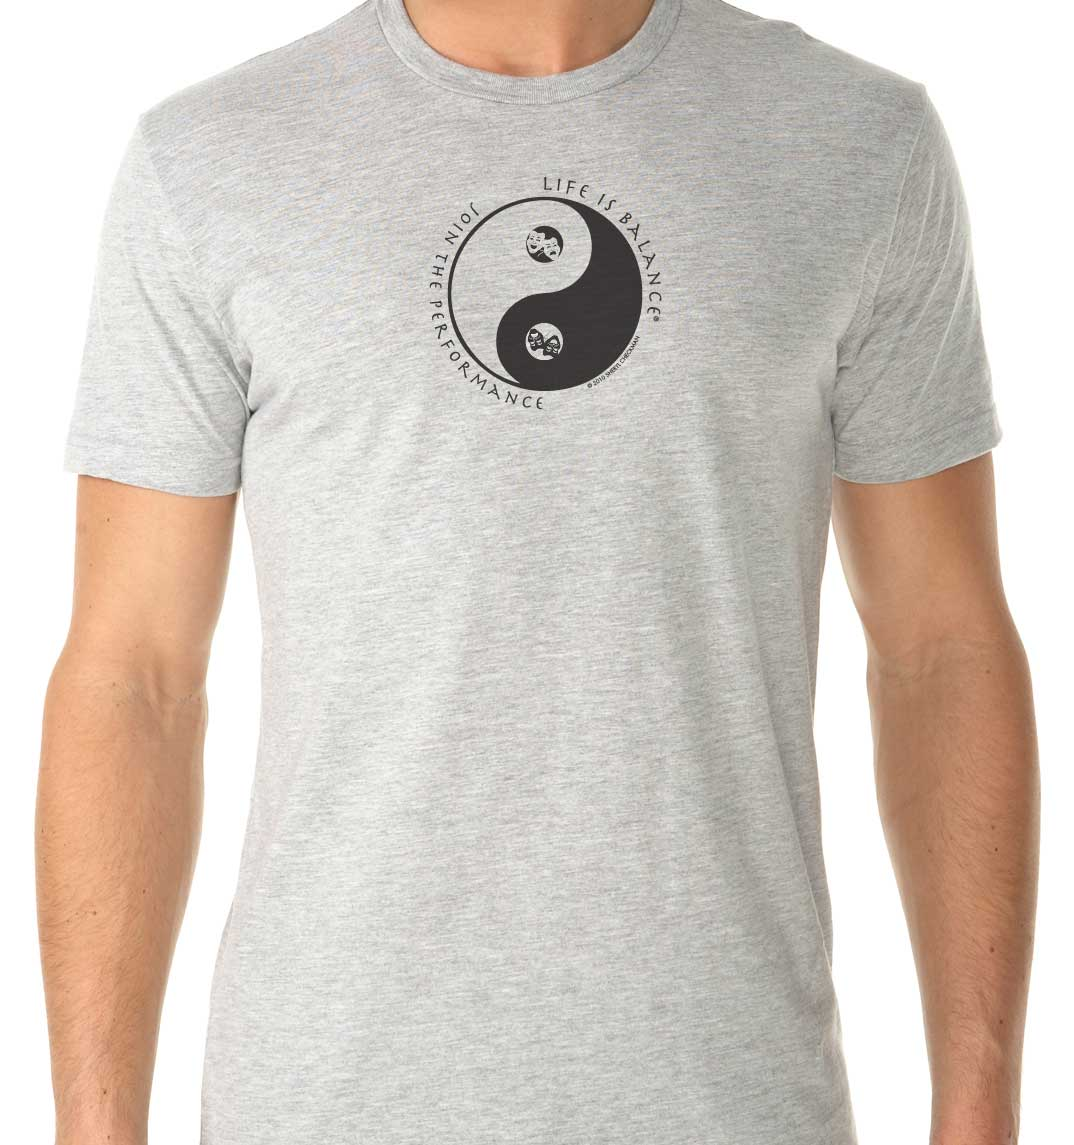 Men's short sleeve theater t-shirt (heather gray)